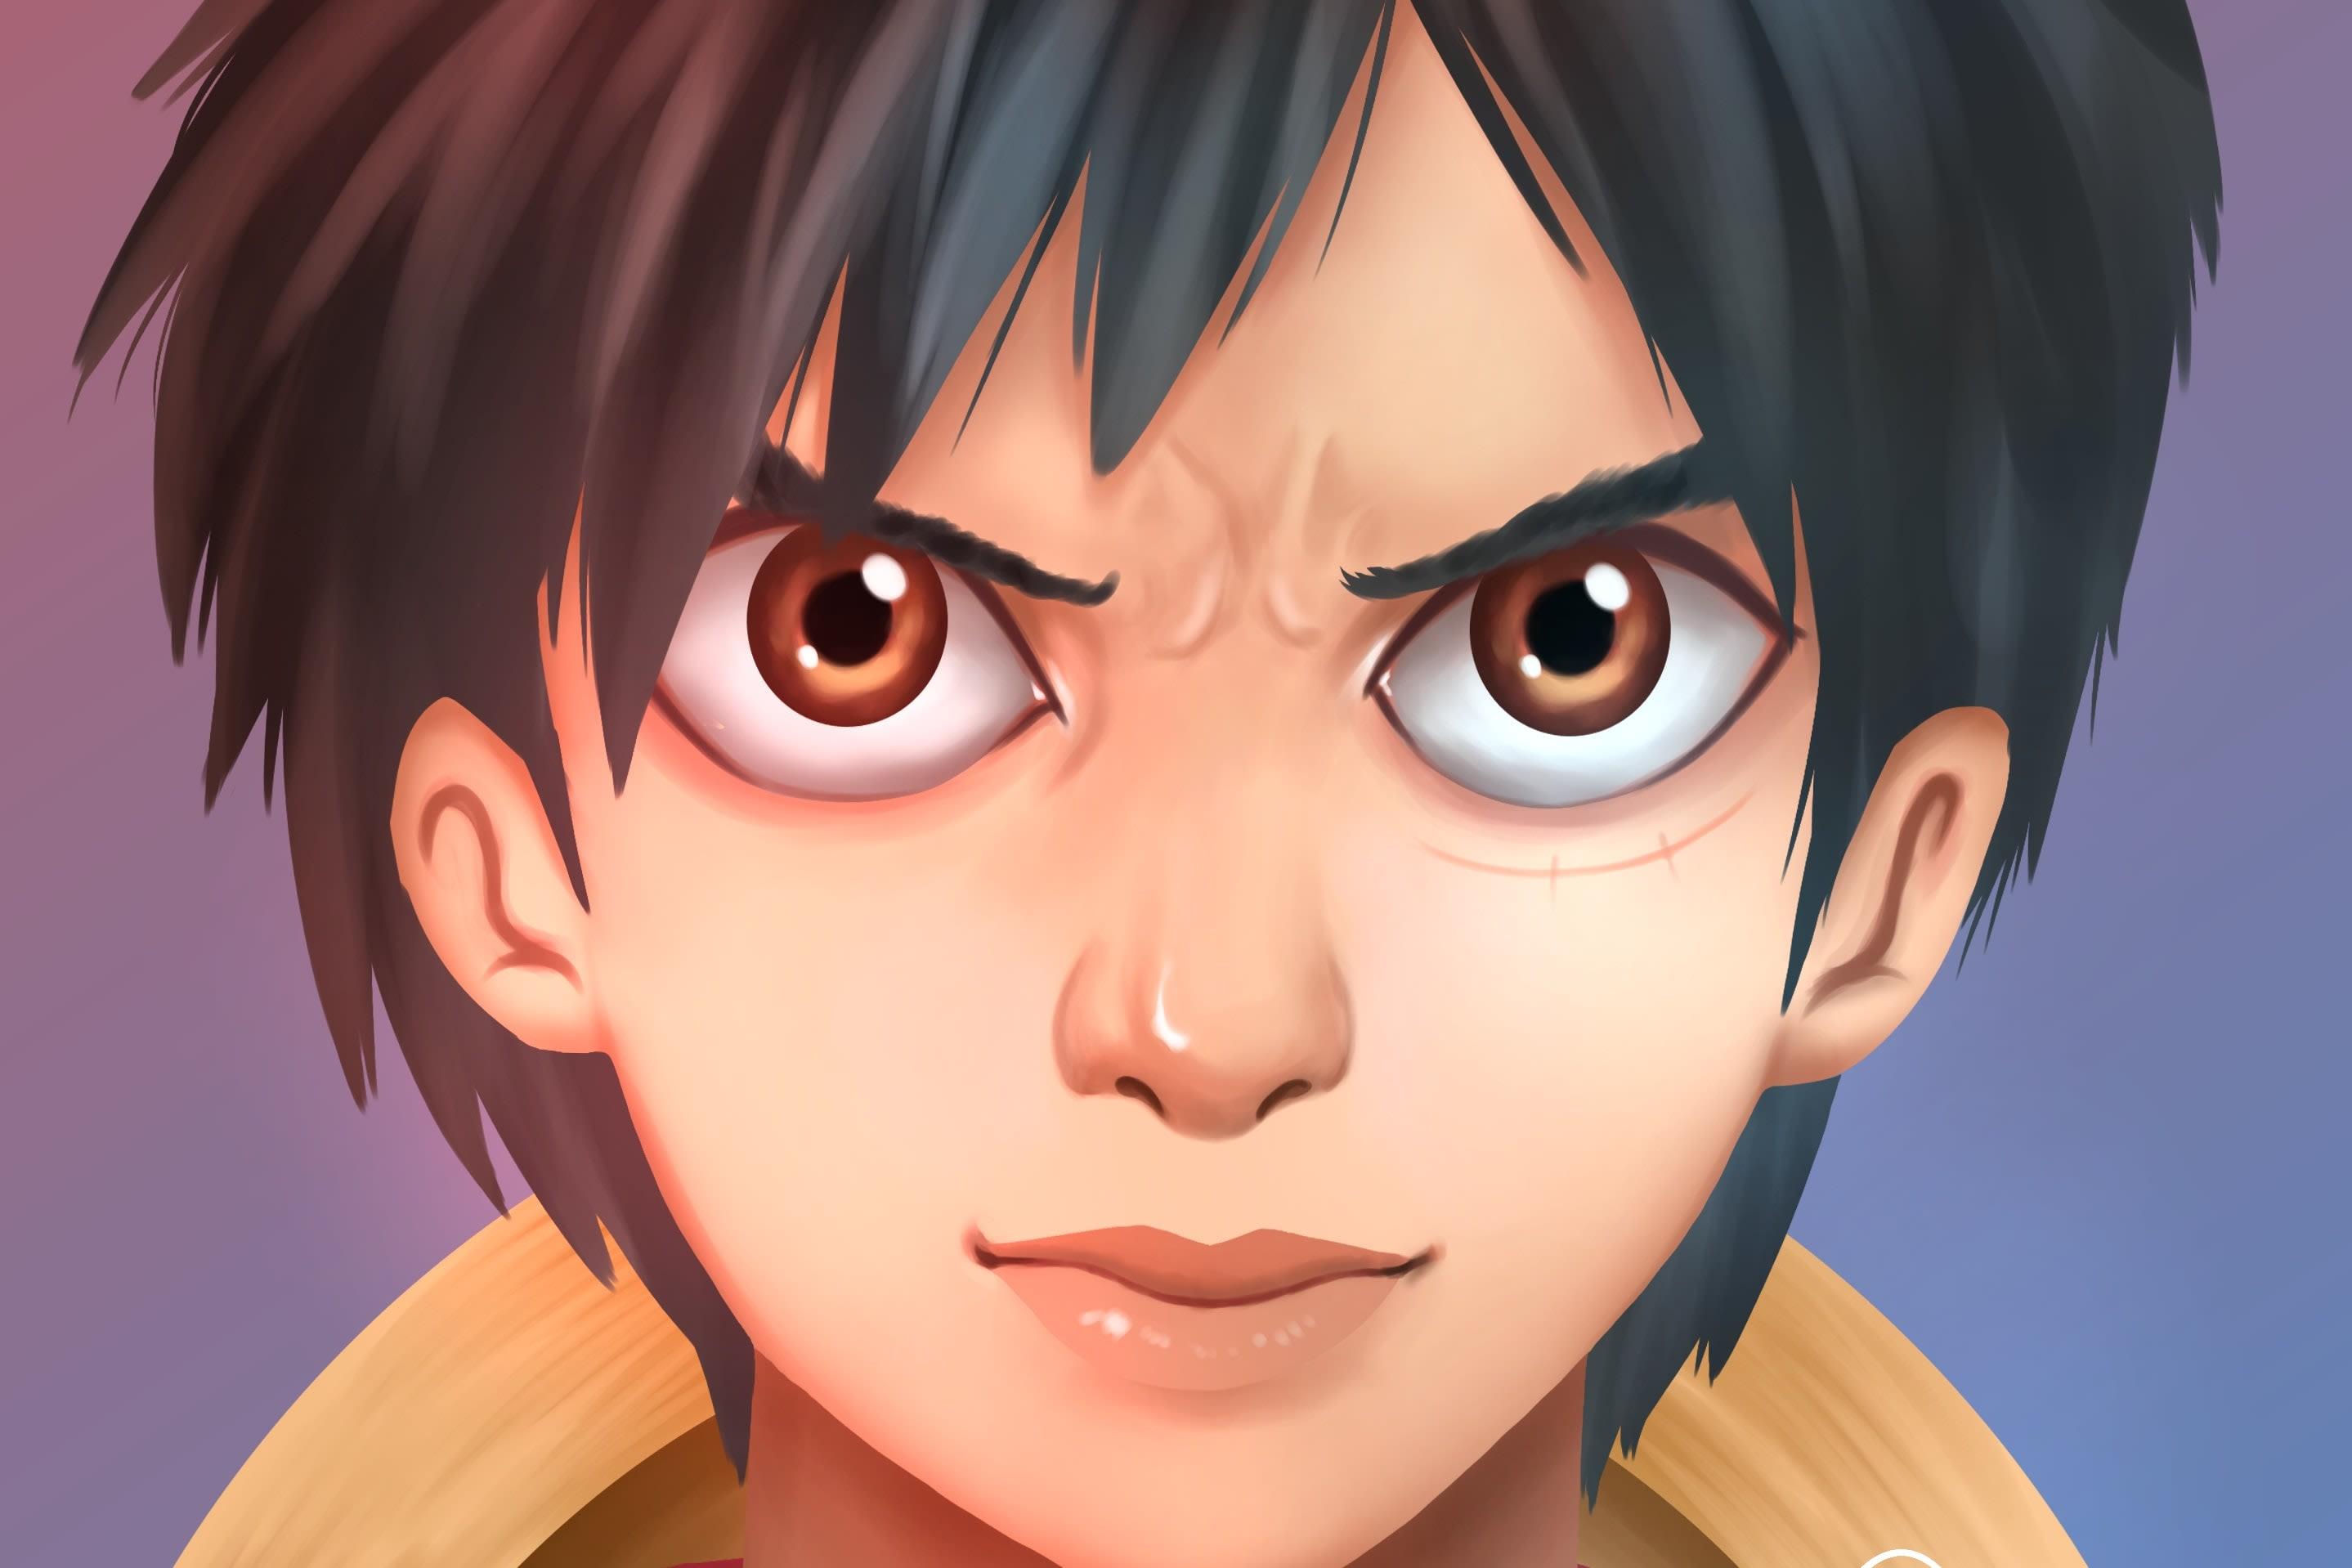 Portfolio for Anime & Chibi Illustrations